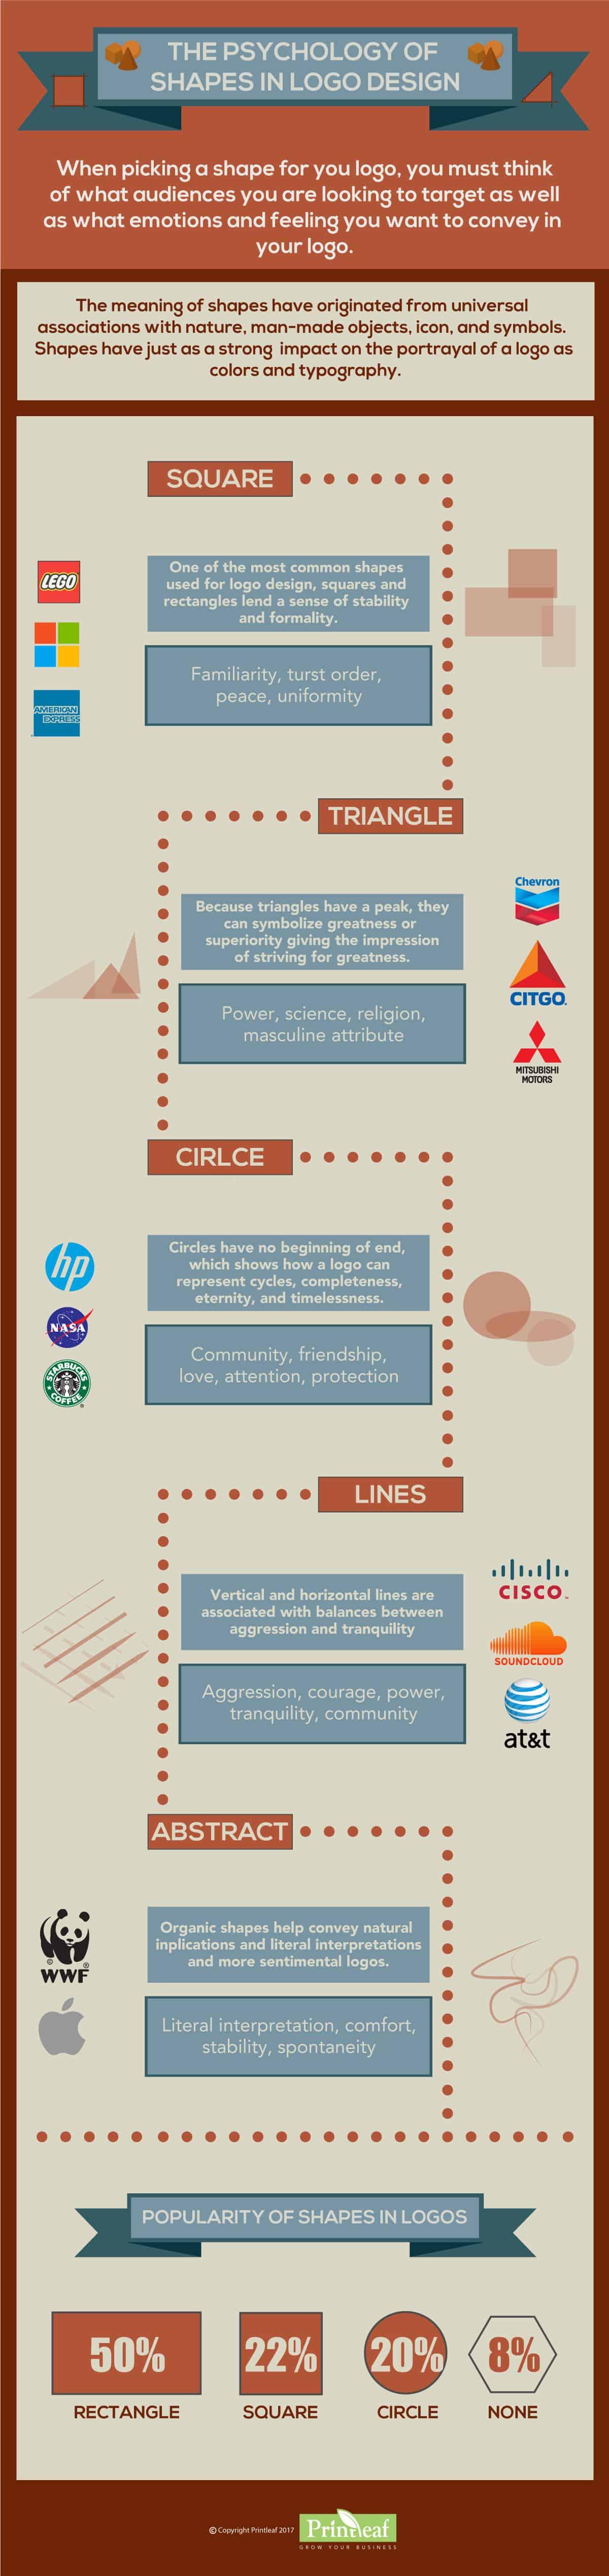 Psychology of Shapes in Logo Design [Infographic]